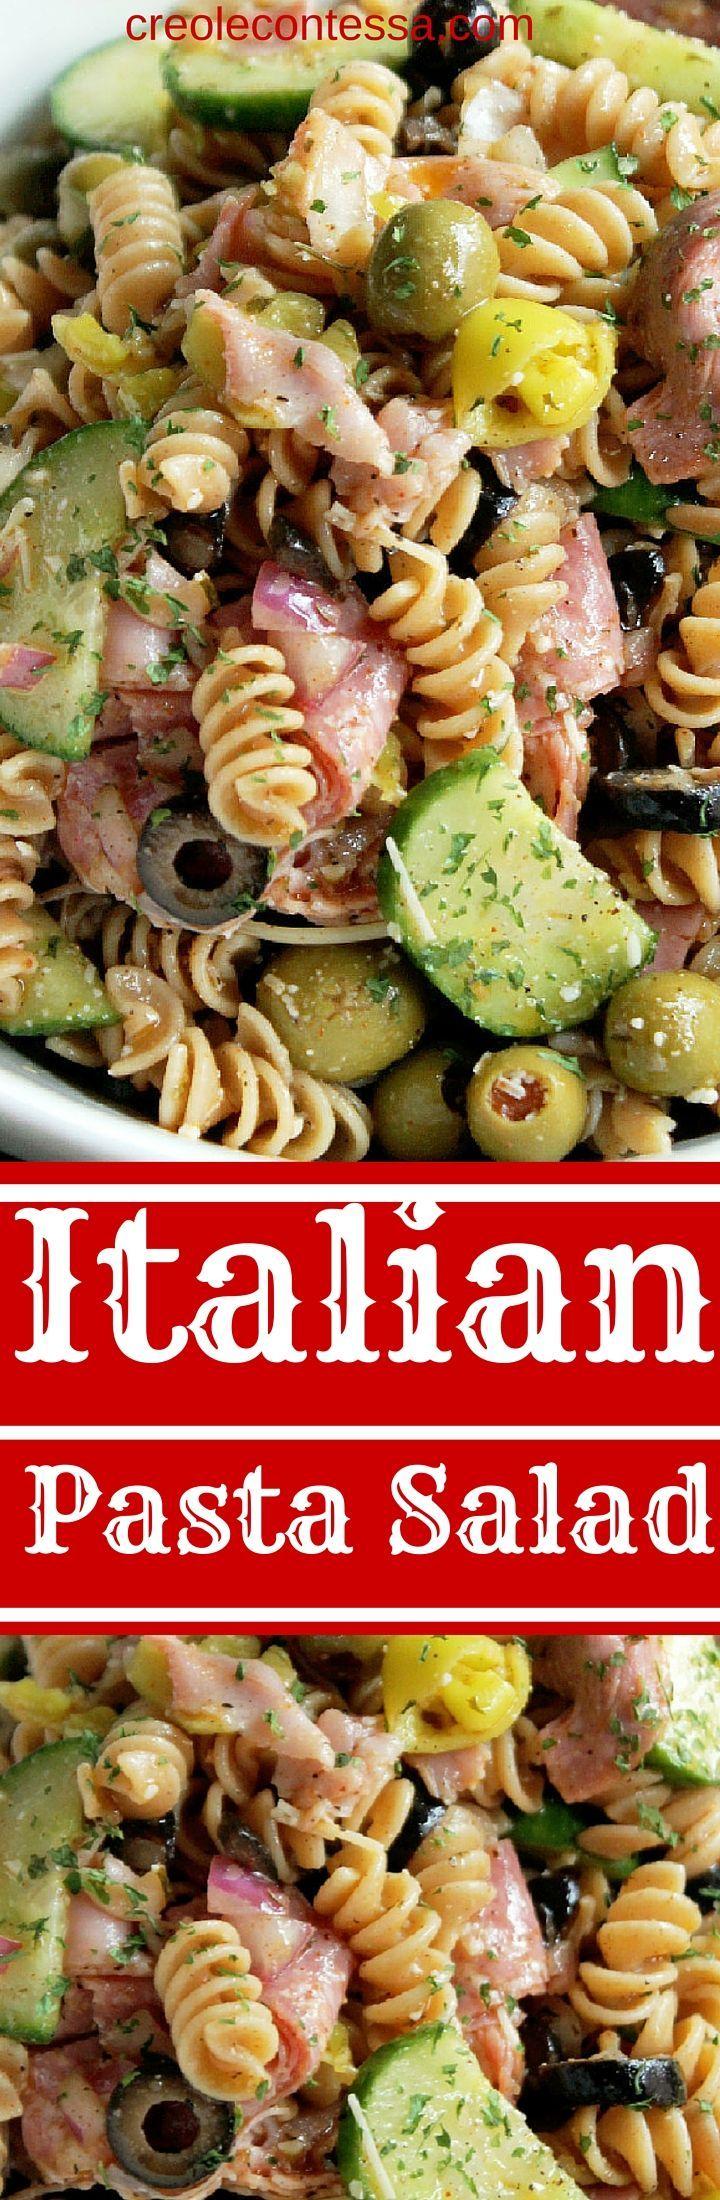 cool Italian Pasta Salad - Creole Contessa